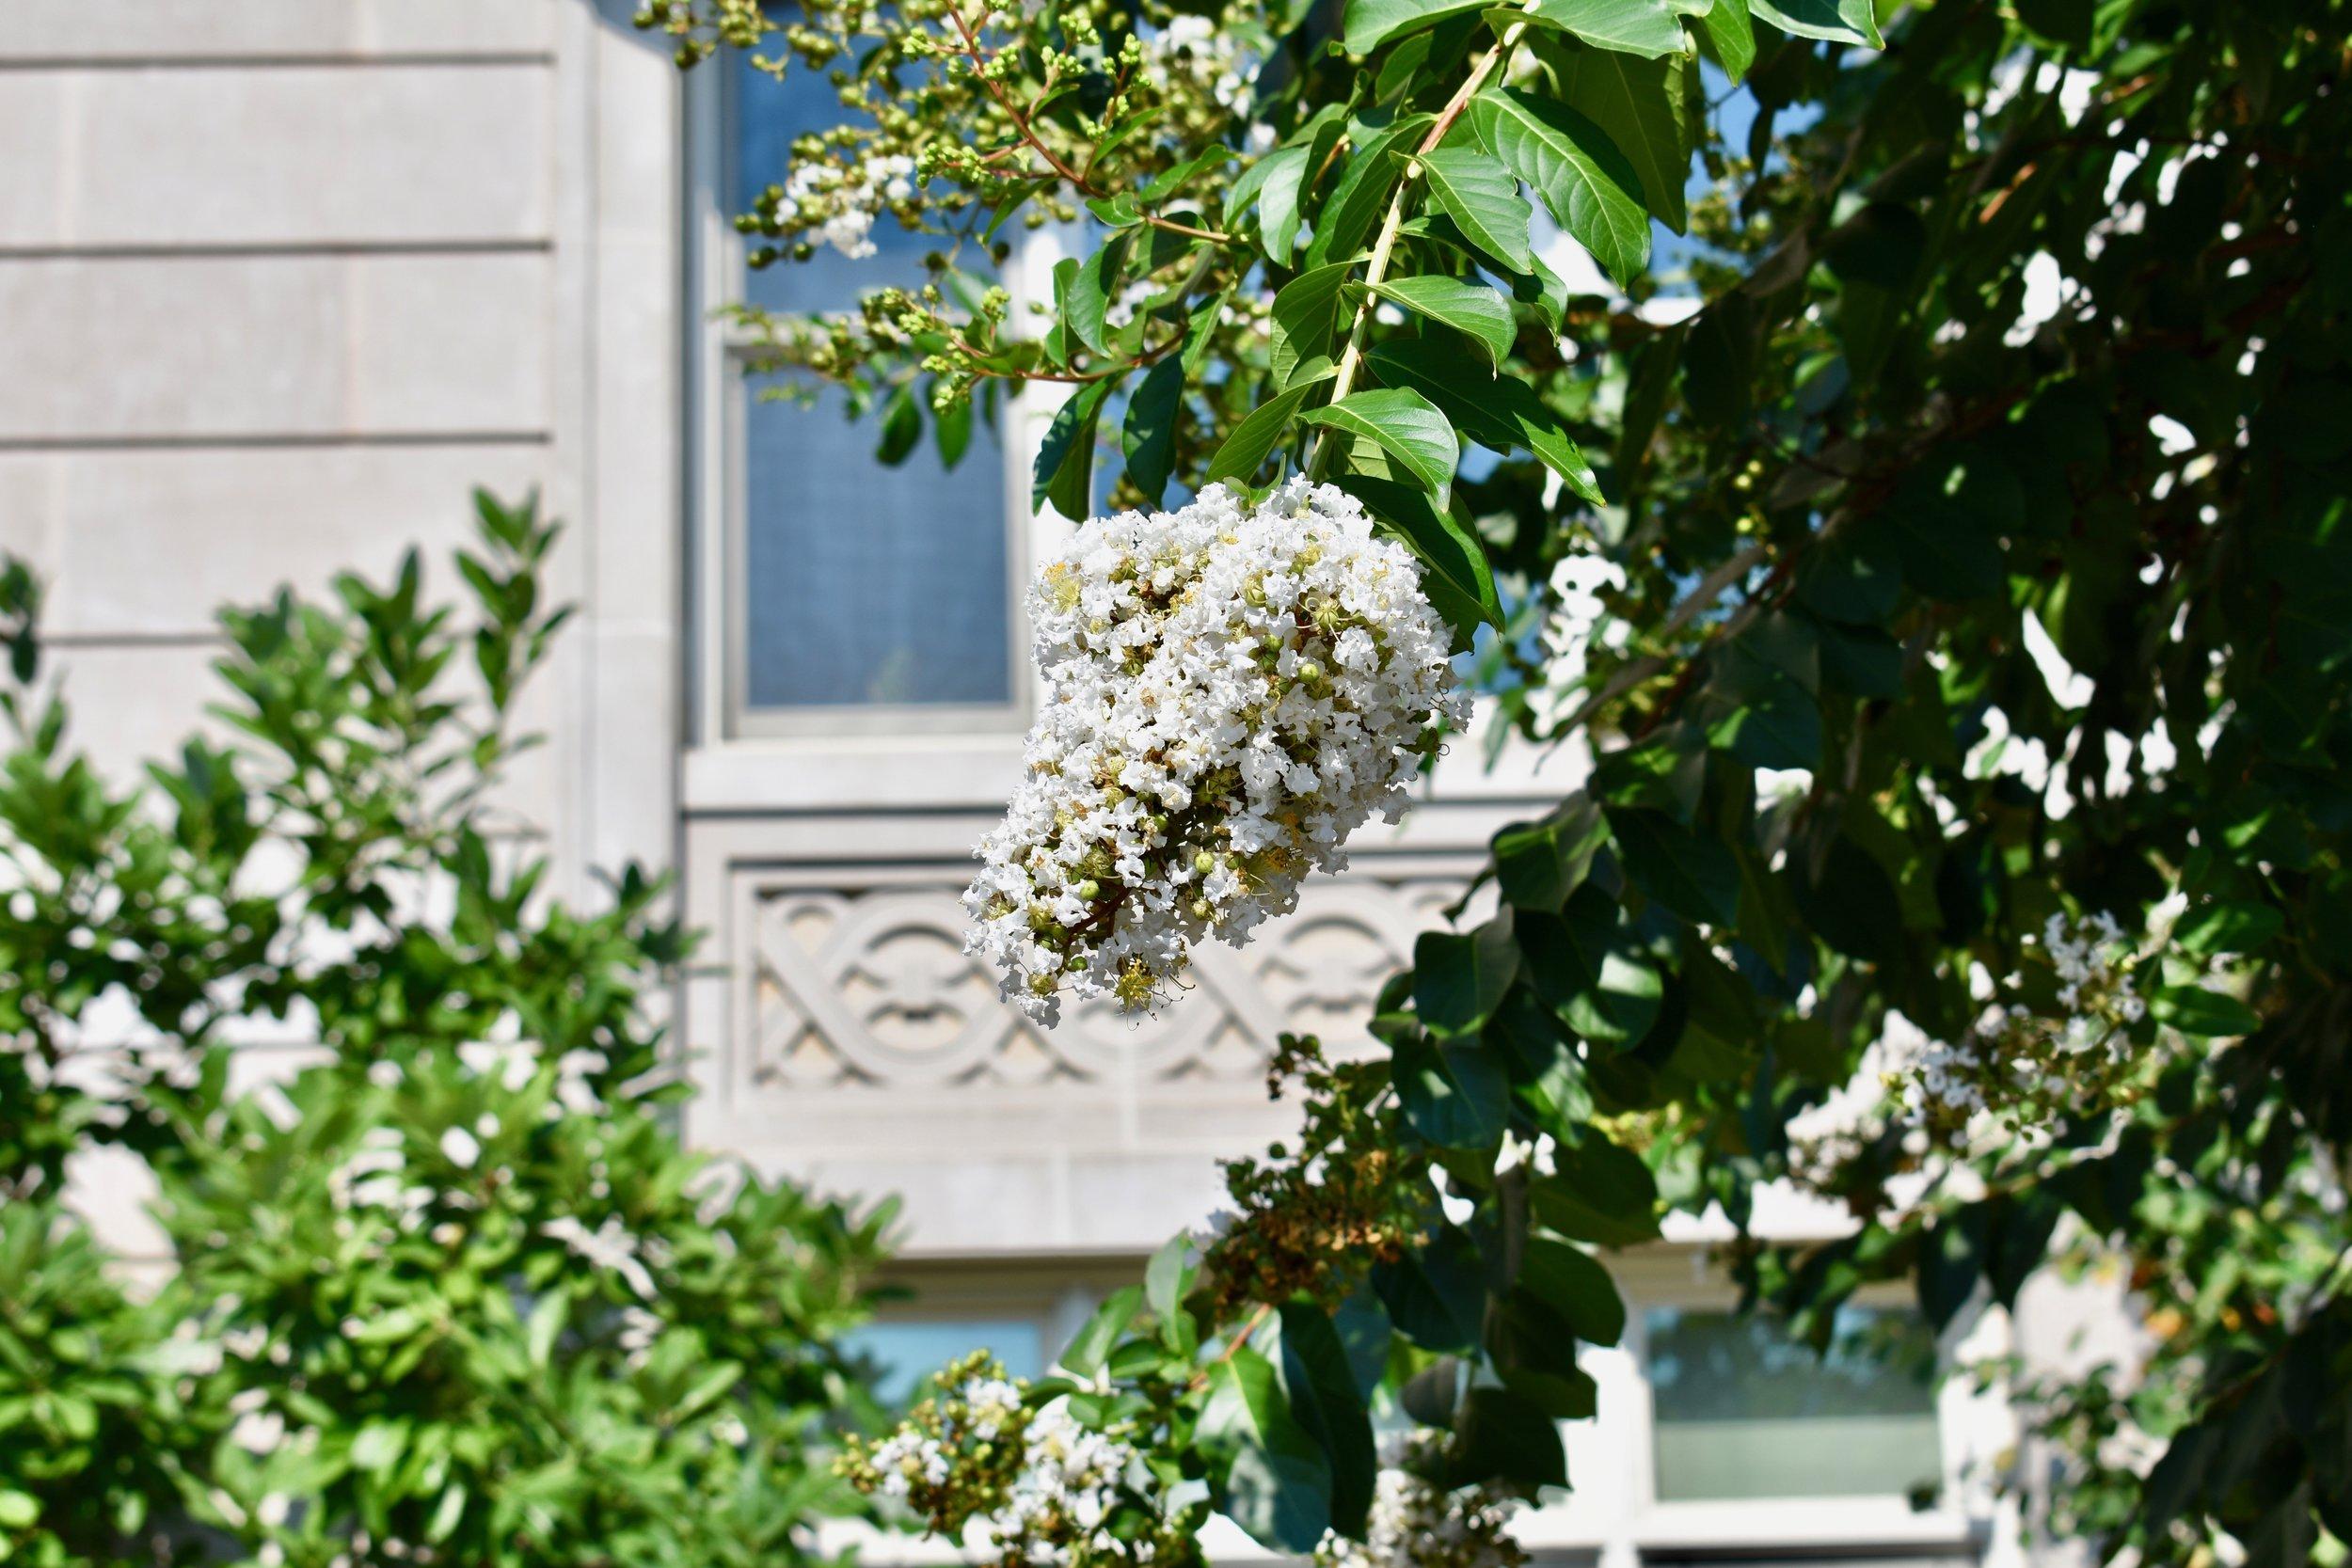 Pretty flowers in Washington D.C.